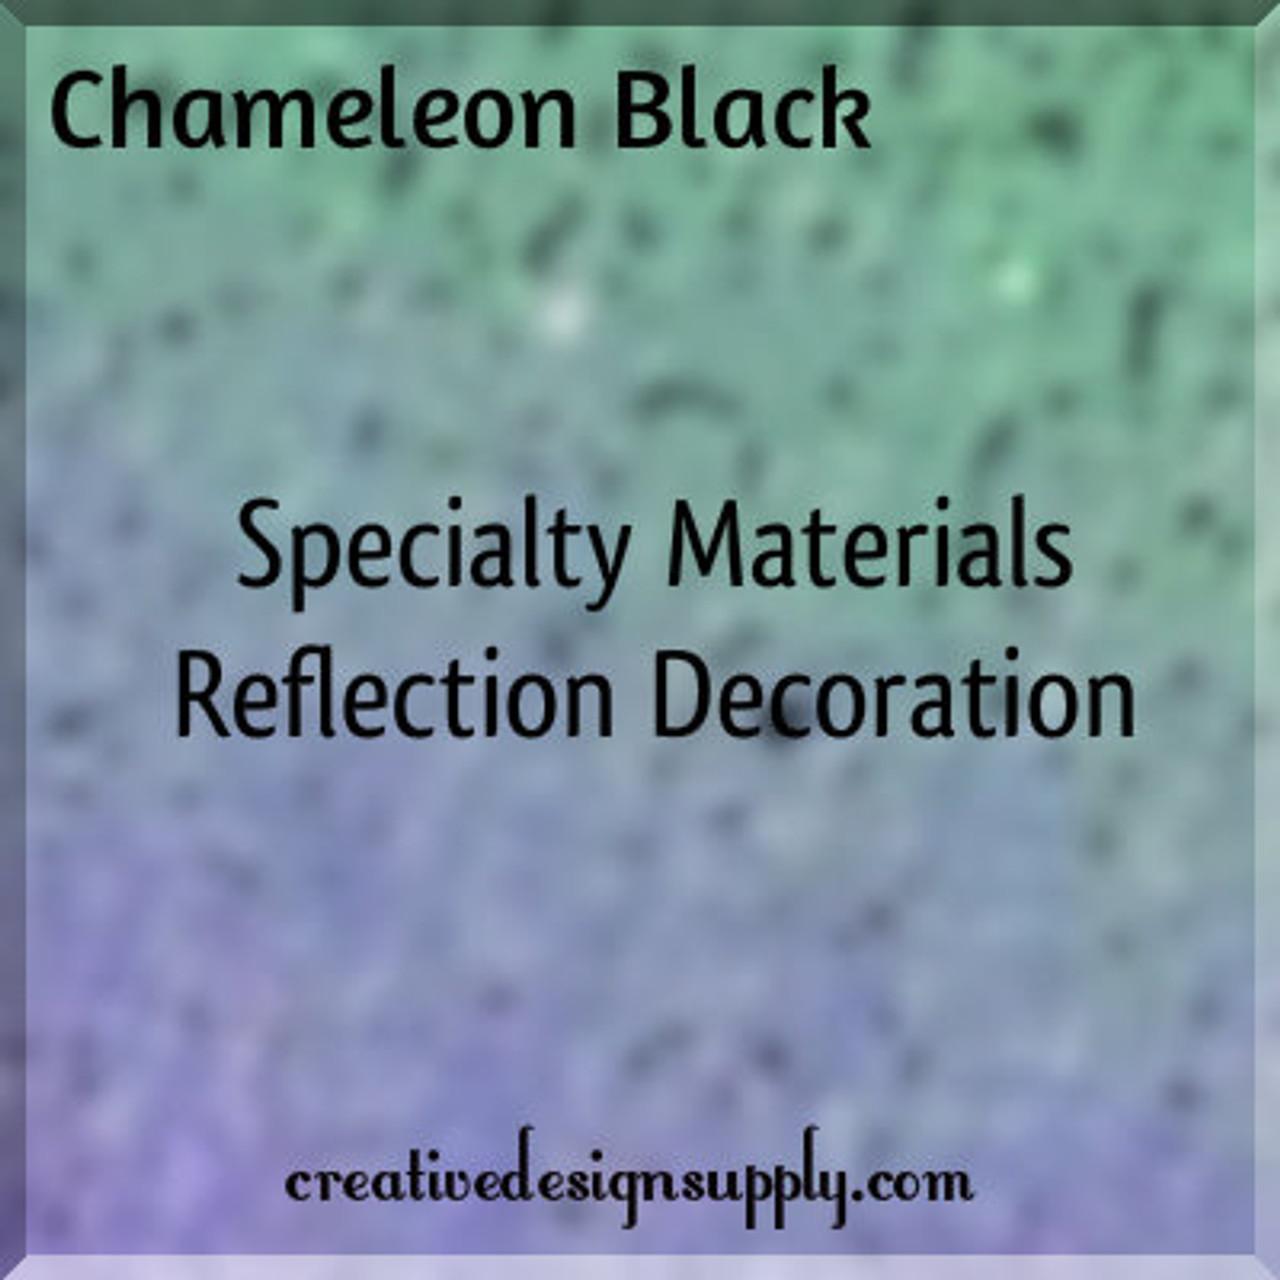 Chameleon Reflection Decoration